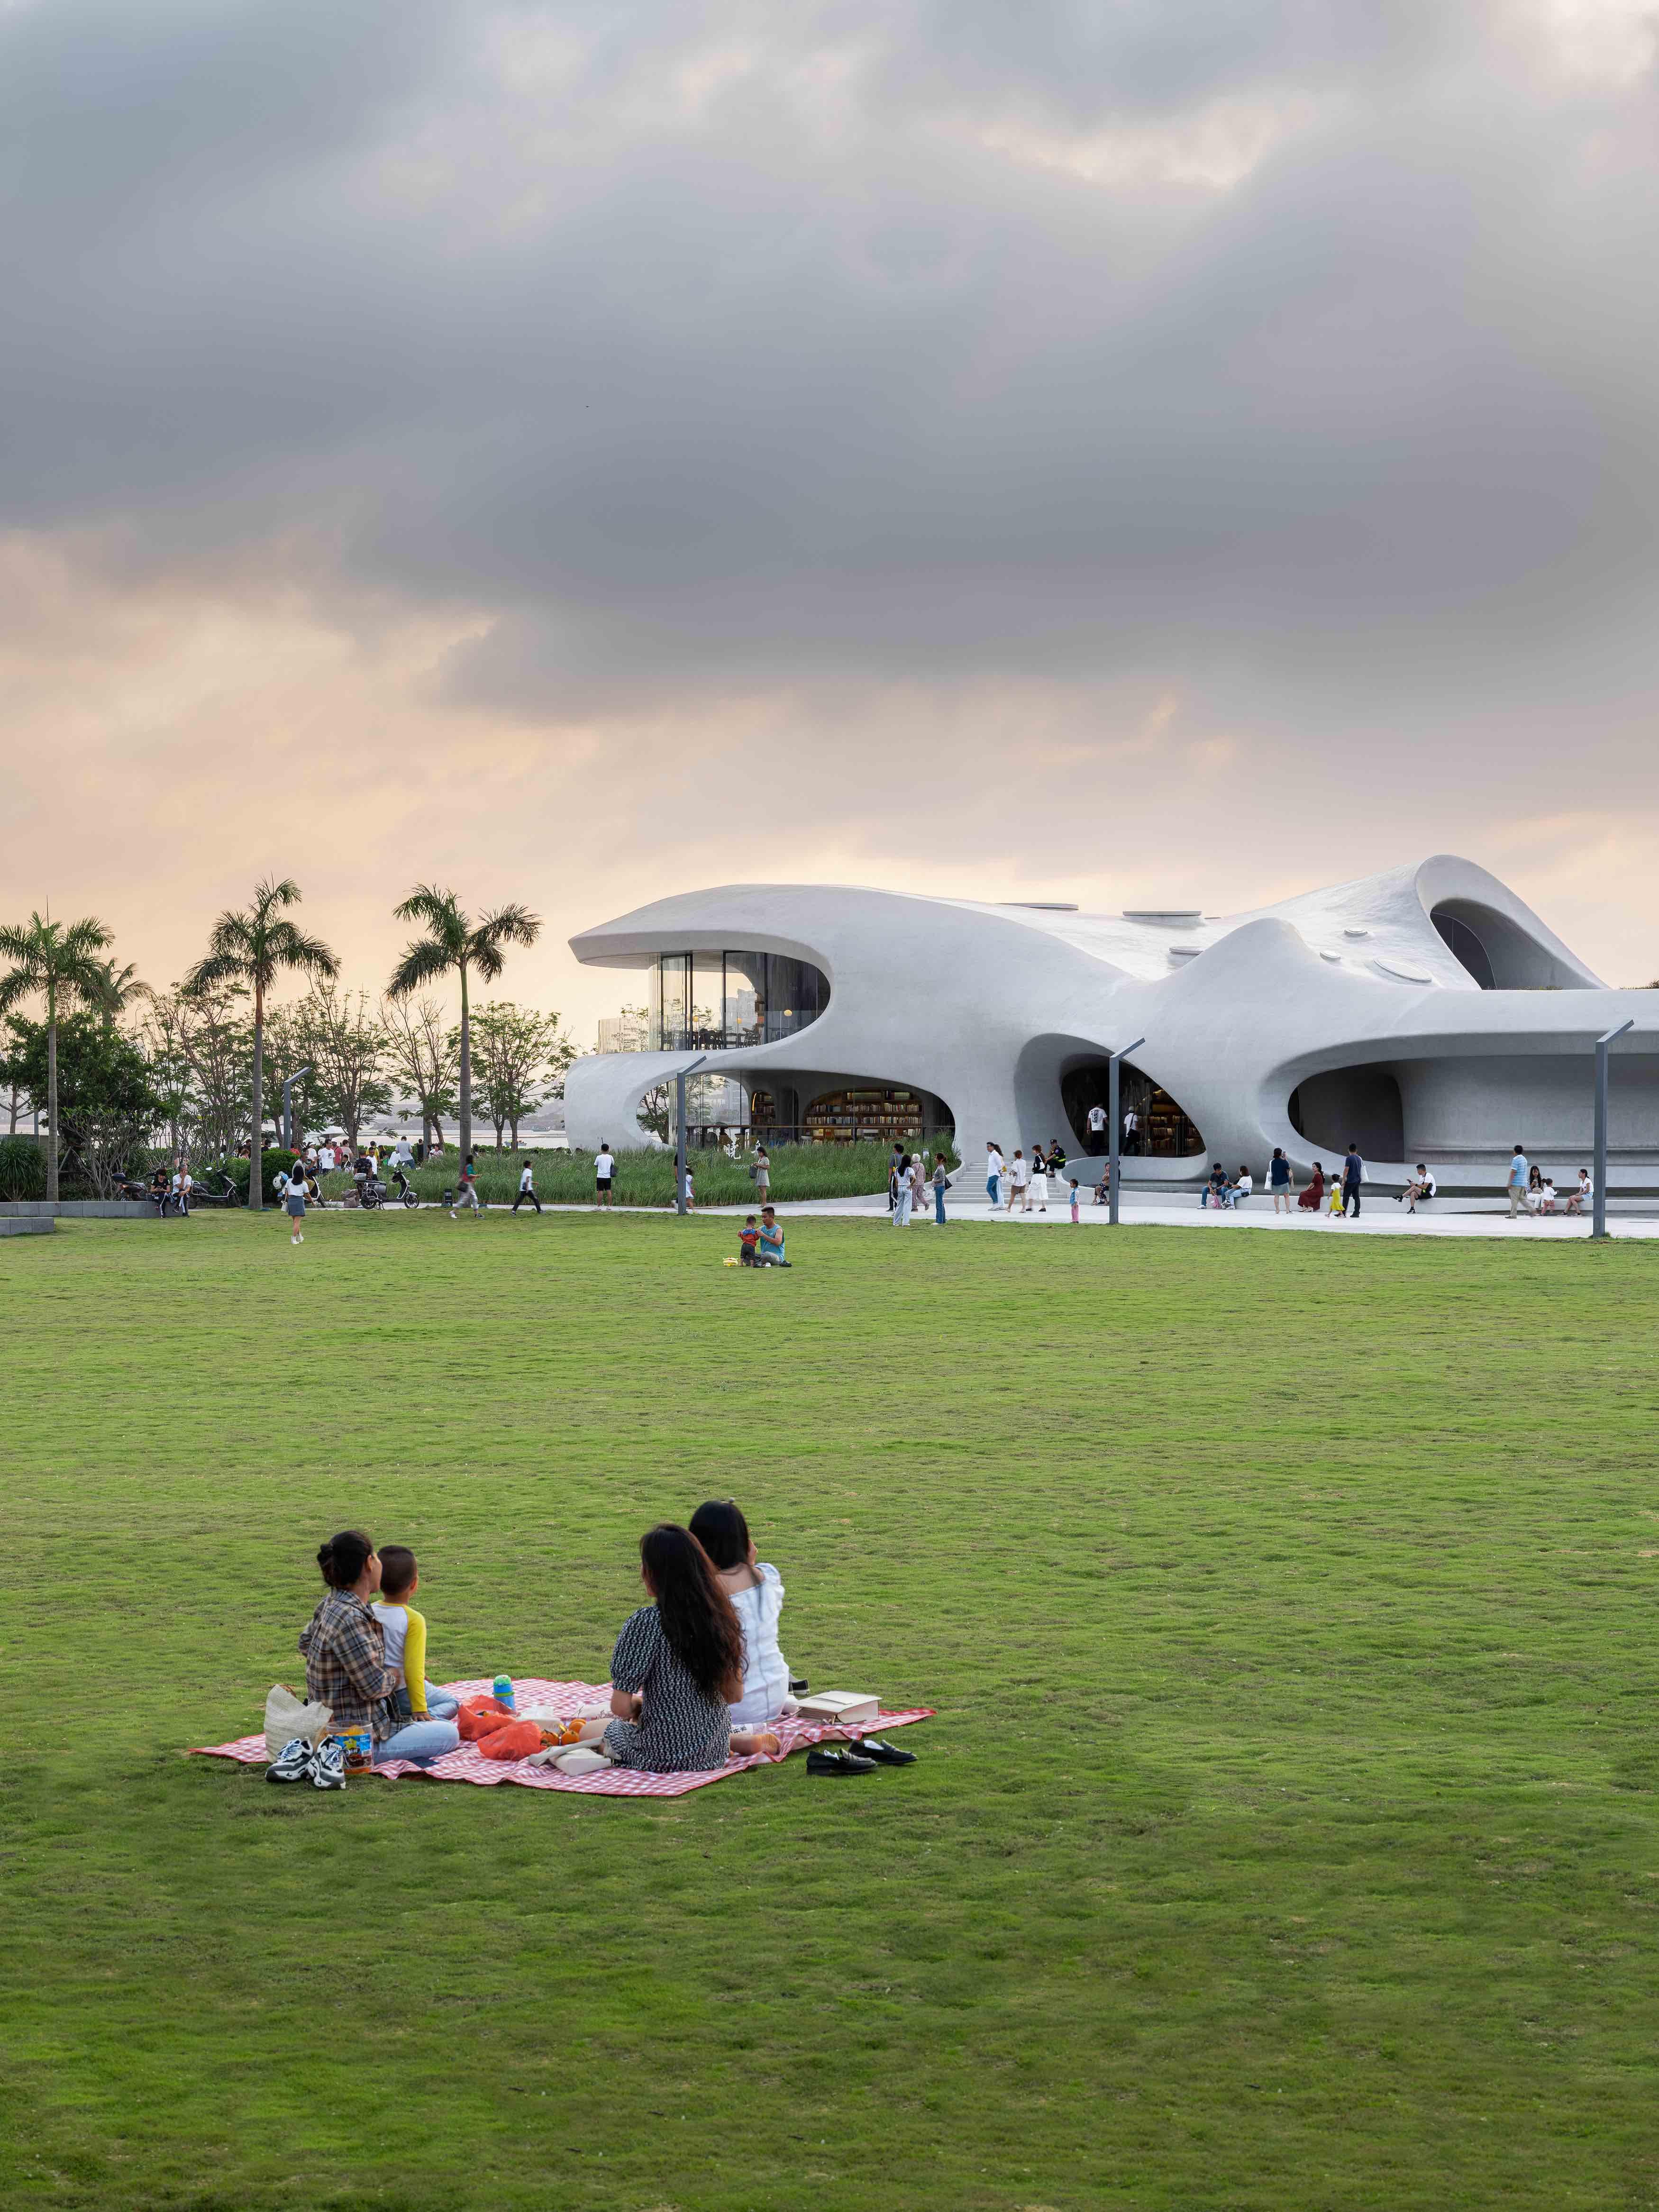 人们在草坪野餐,欣赏建筑  CreatAR Images